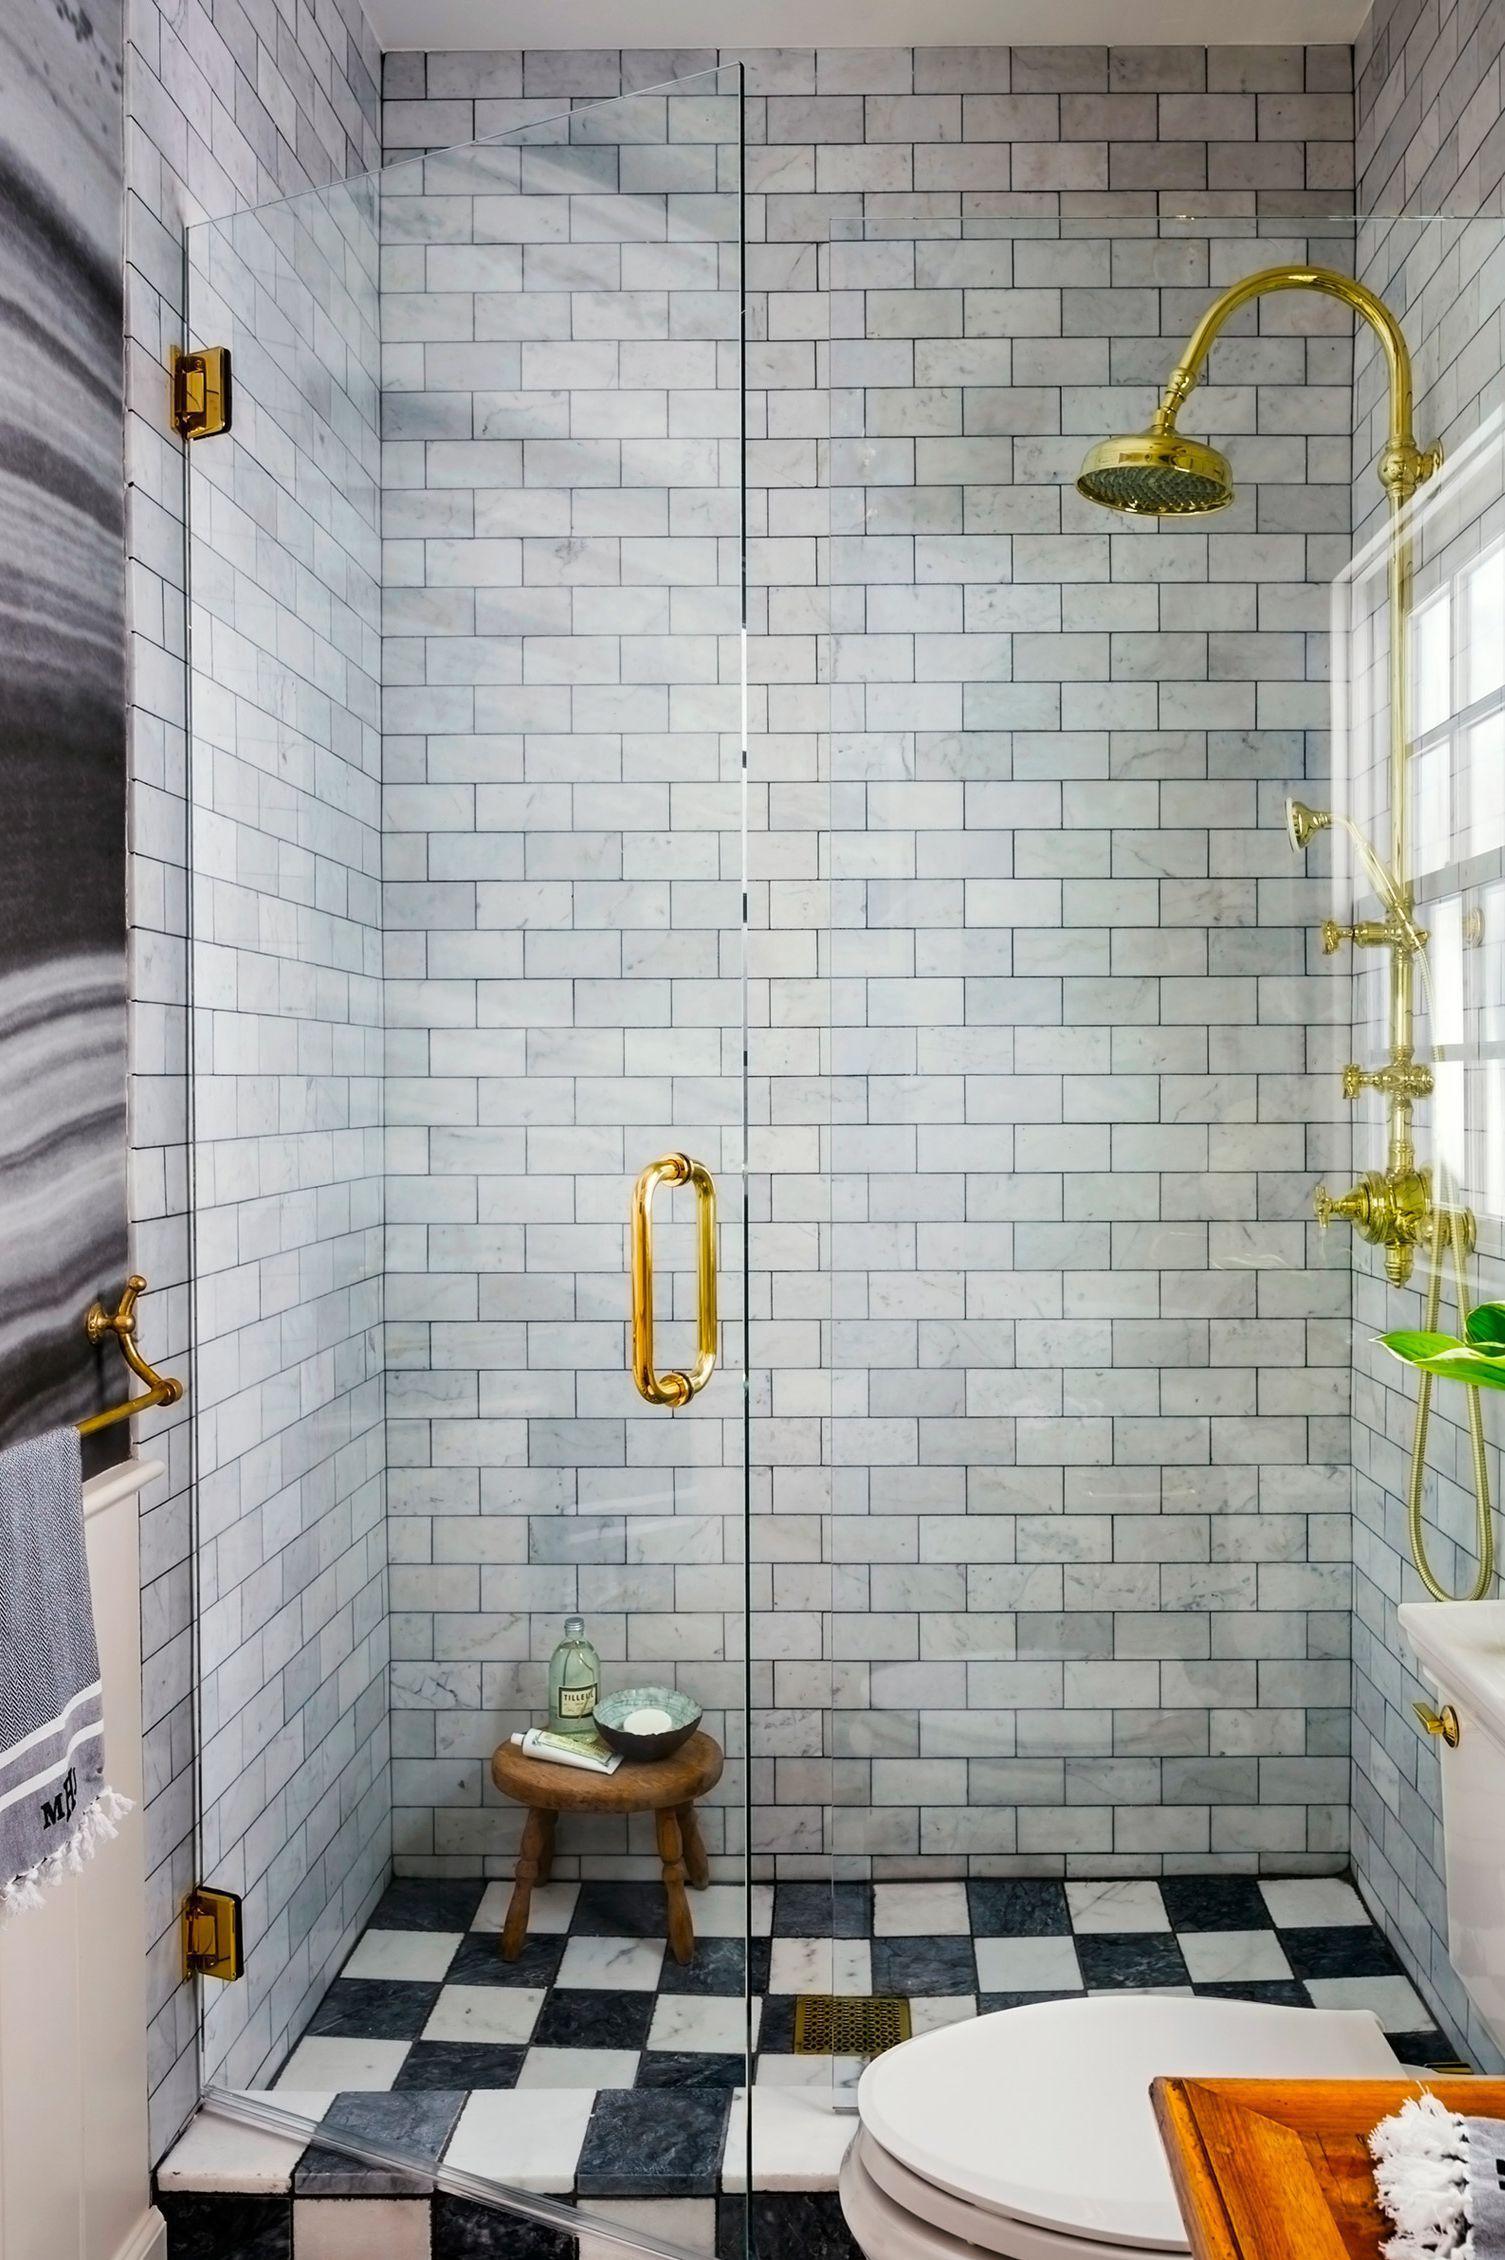 34 Attractive Designer Tiles Decortez Bathroom Wall Tile Design Tile Bathroom Bathroom Tile Designs